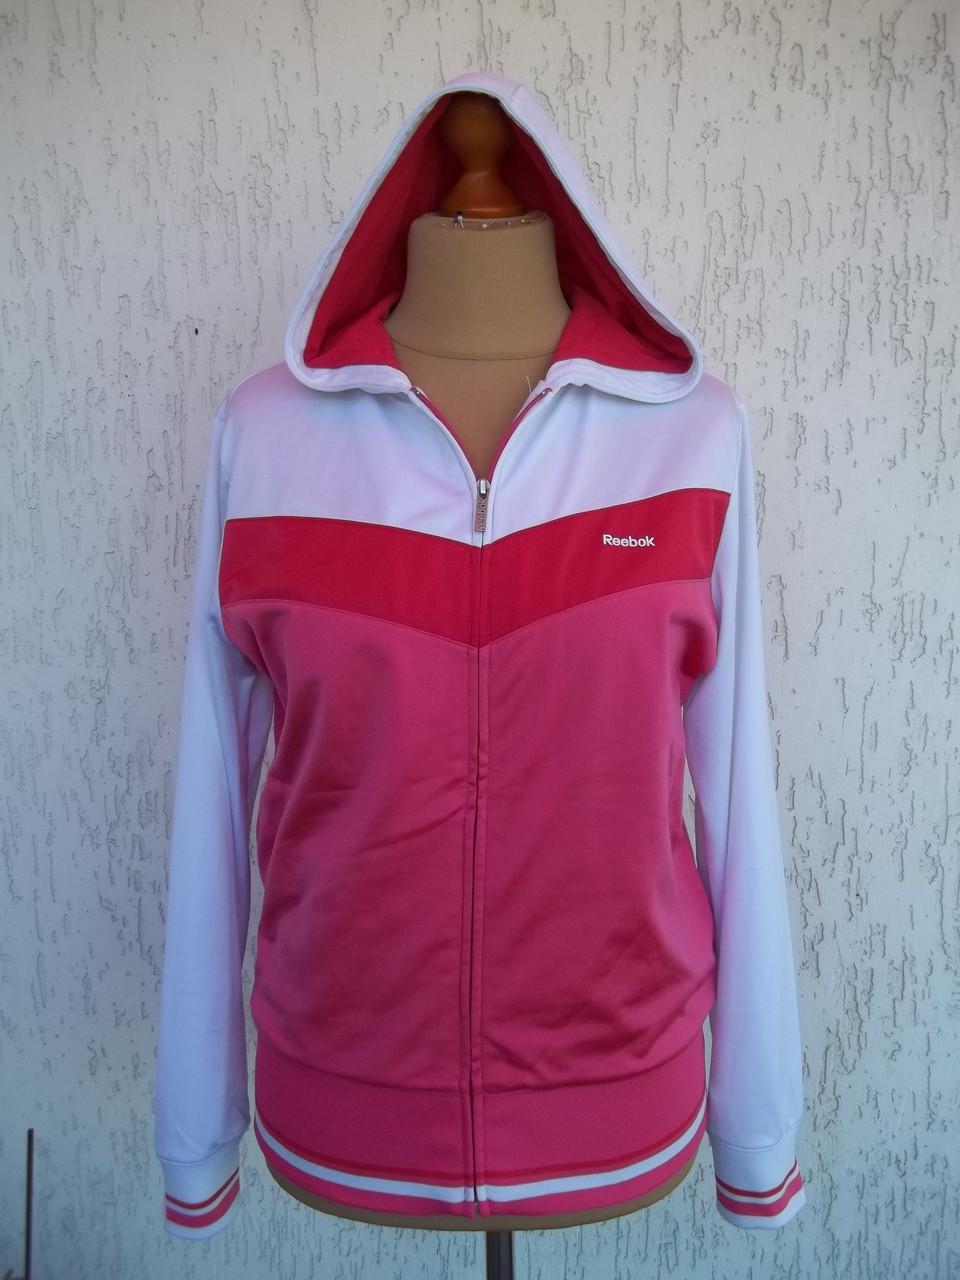 12f5696a Спорт свитер мастерка олимпийка женская REEBOK (46/48р) Германия Оригинал -  Товары из